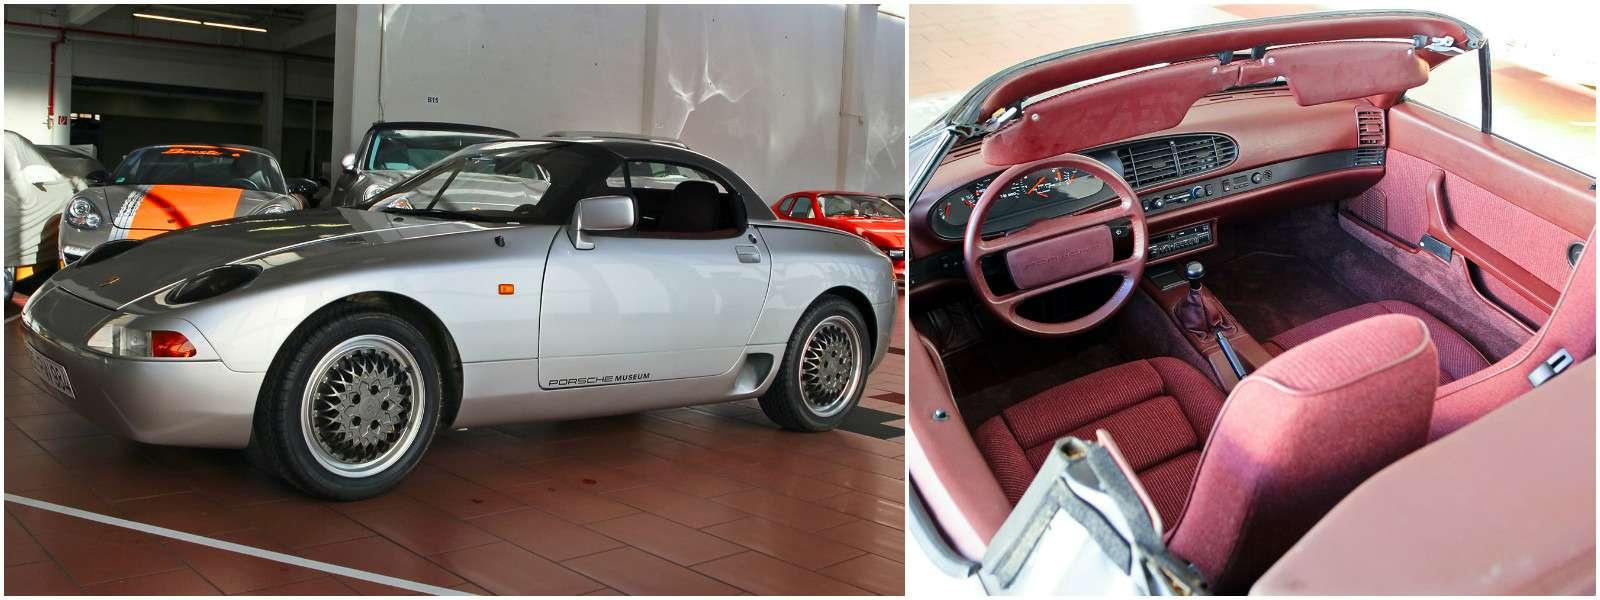 Секретный гараж Porsche: Лада Самара идругие— фото 700190